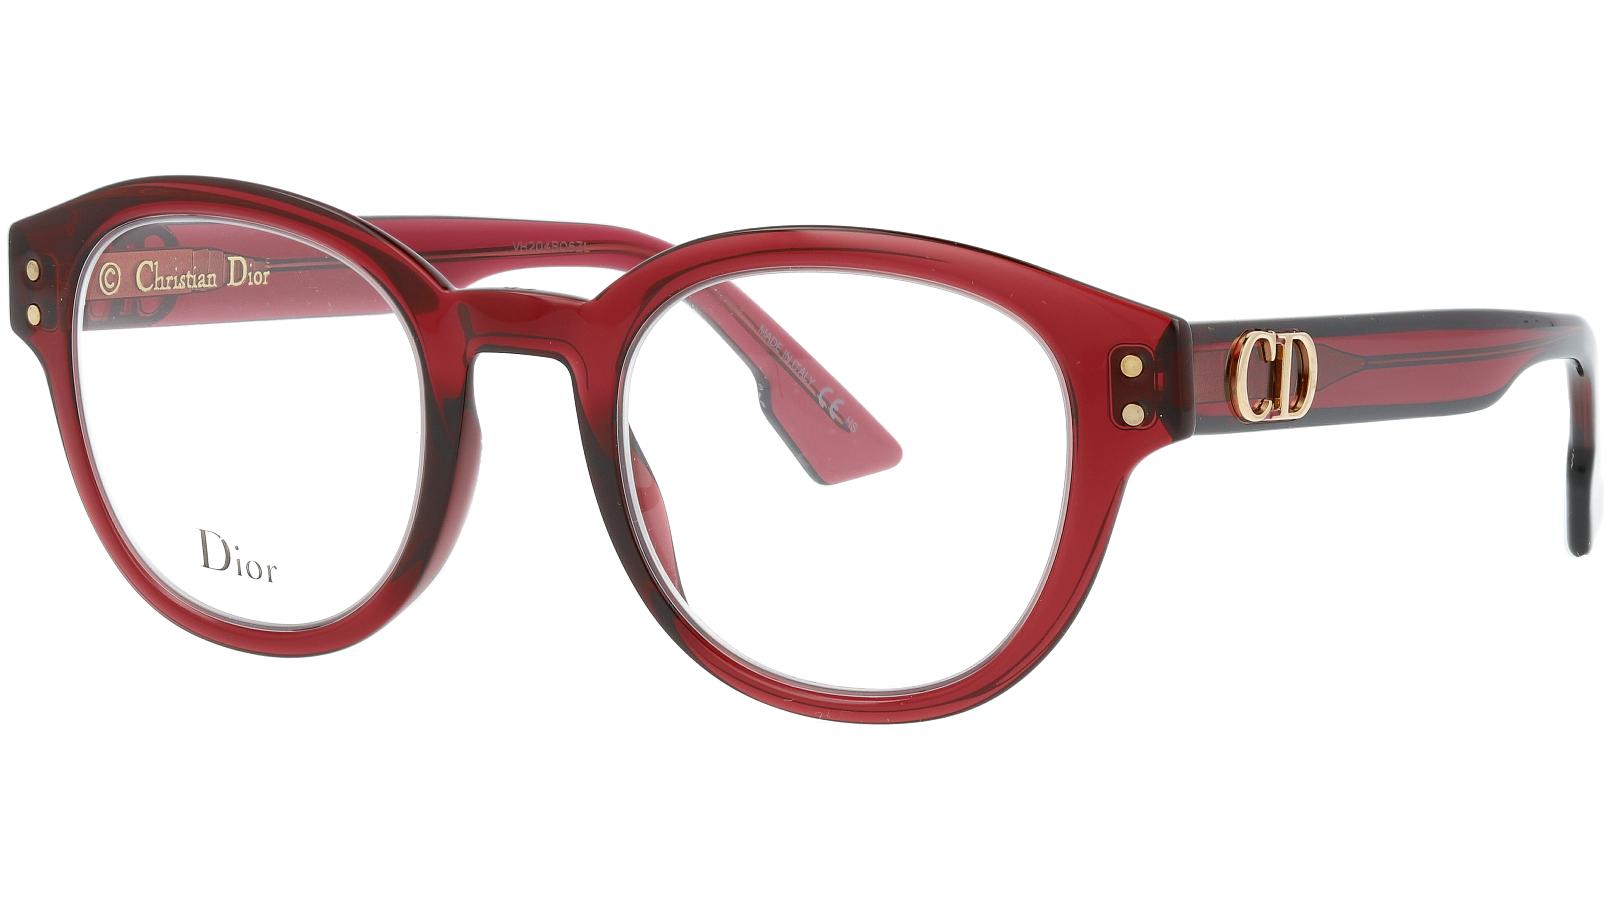 Dior CD2 LHF 46 BurgunD Glasses